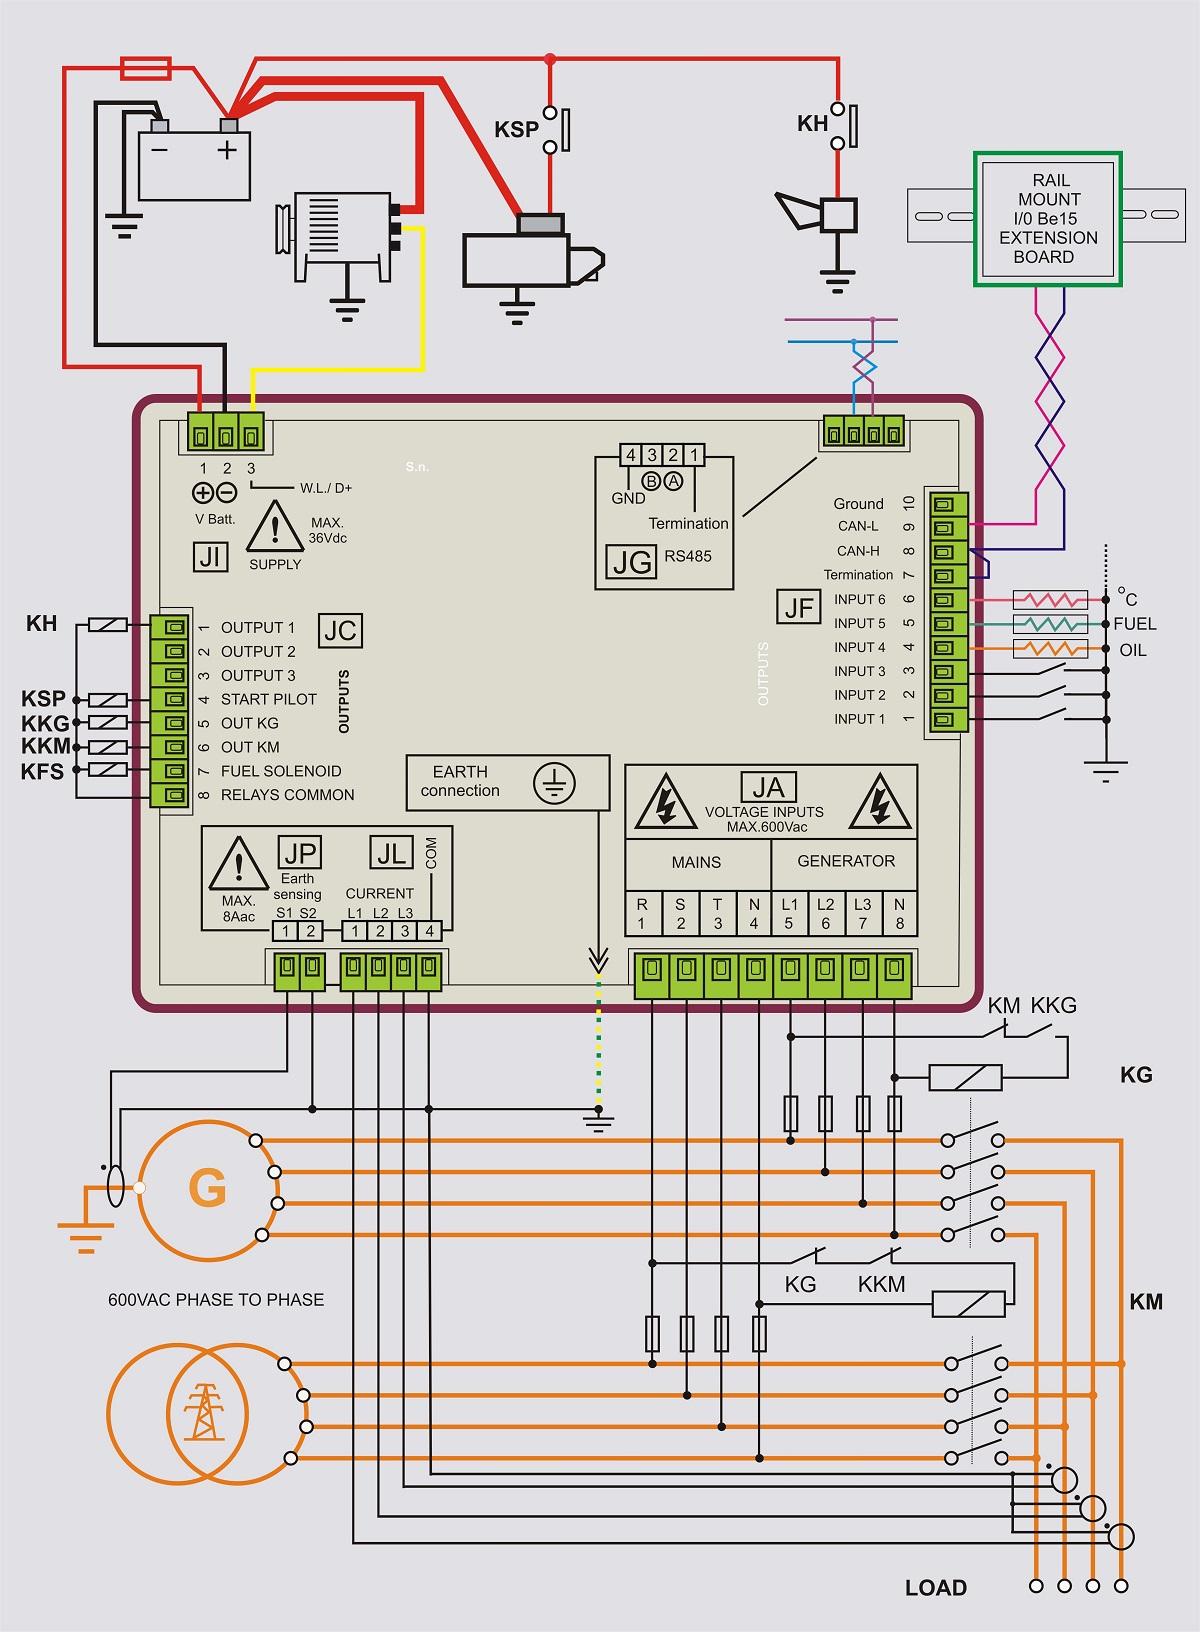 champion generator wiring diagram 1999 ford f150 headlight waterway library bajaj 4s 32 images rh n 0 co on